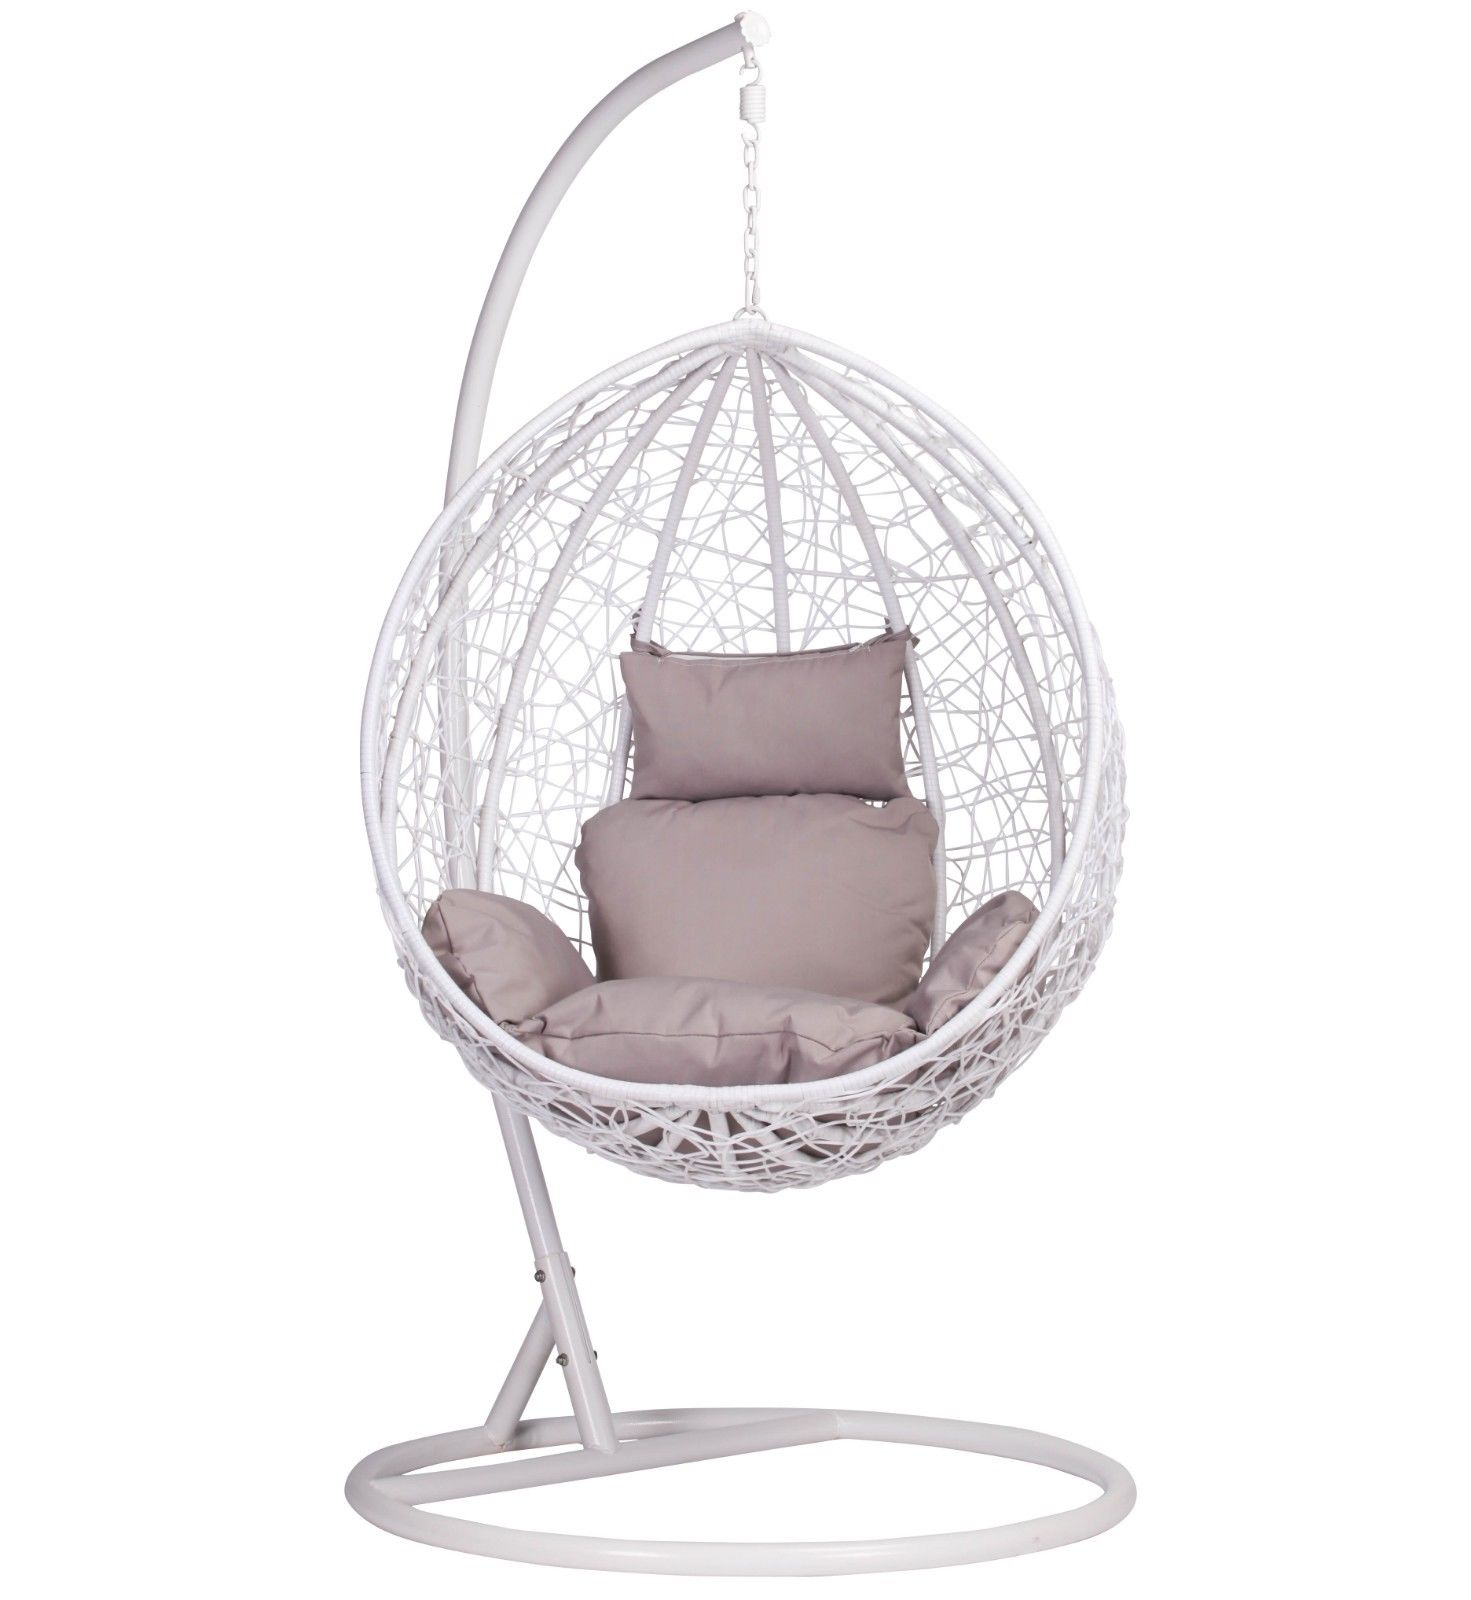 White Rattan Swing Weave Patio Garden Hanging Egg Chair ...